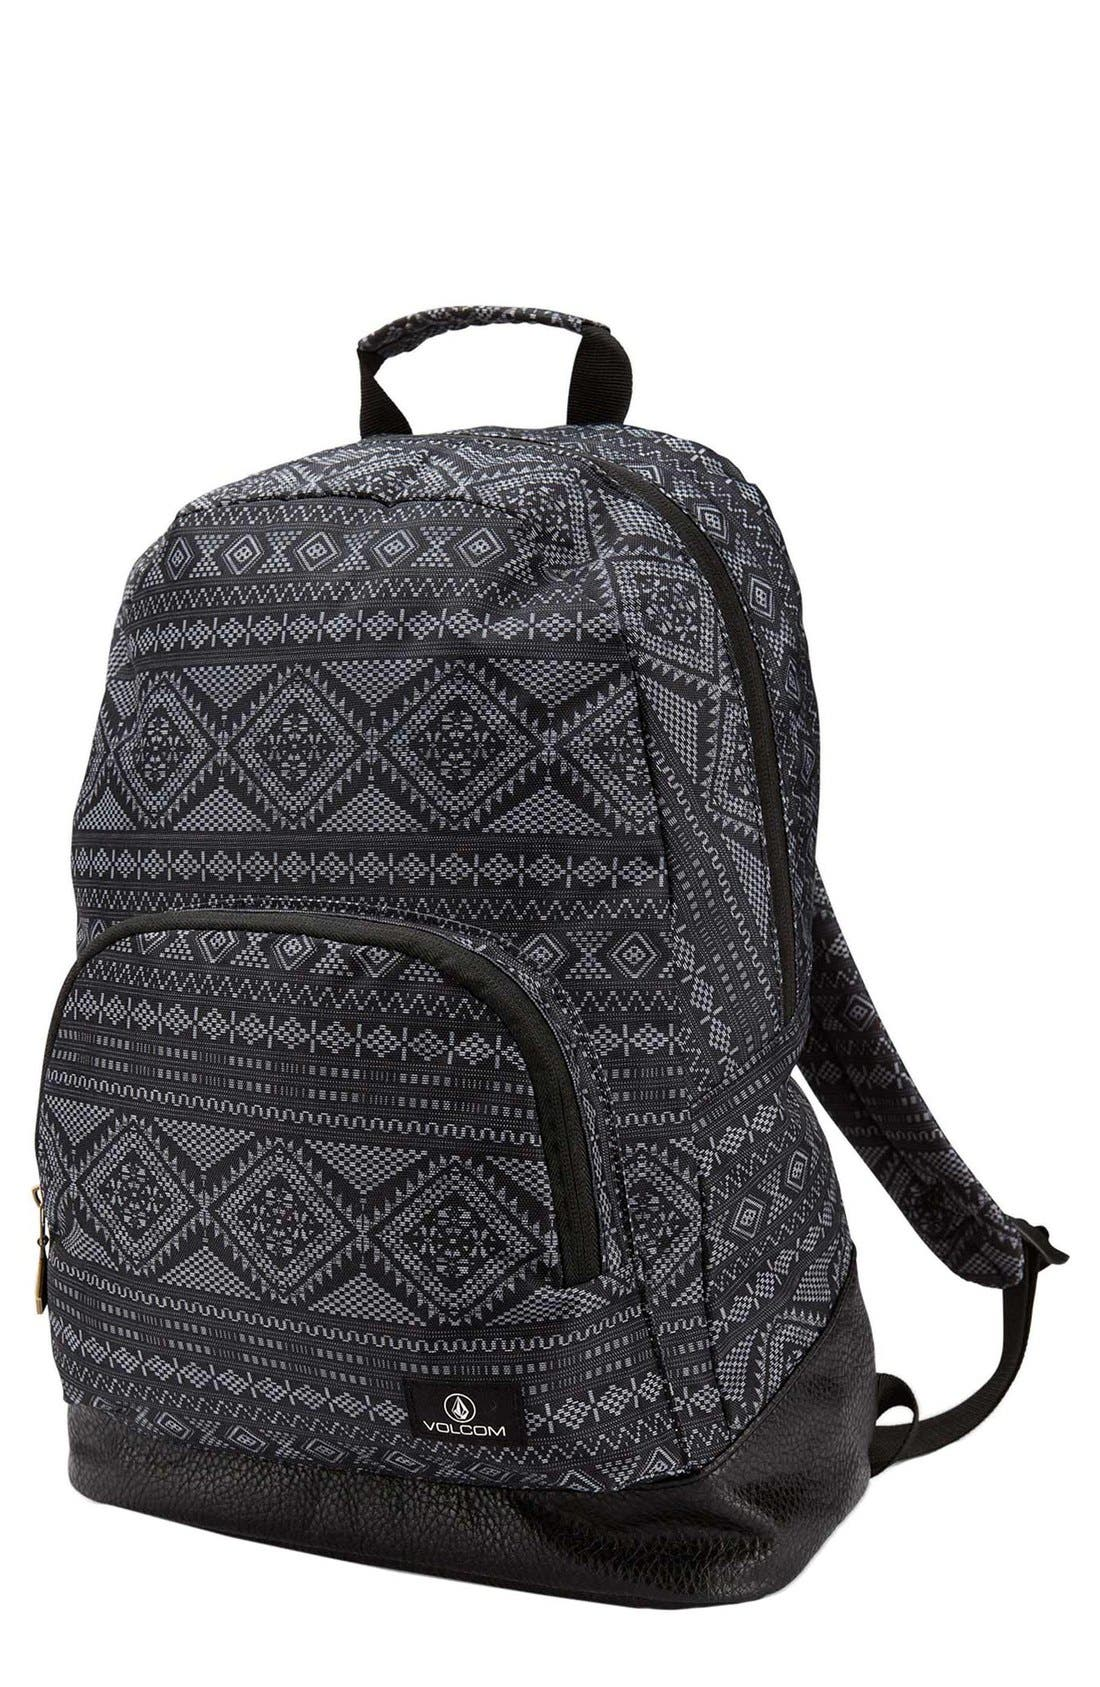 Alternate Image 1 Selected - Volcom 'Schoolyard' Print Backpack